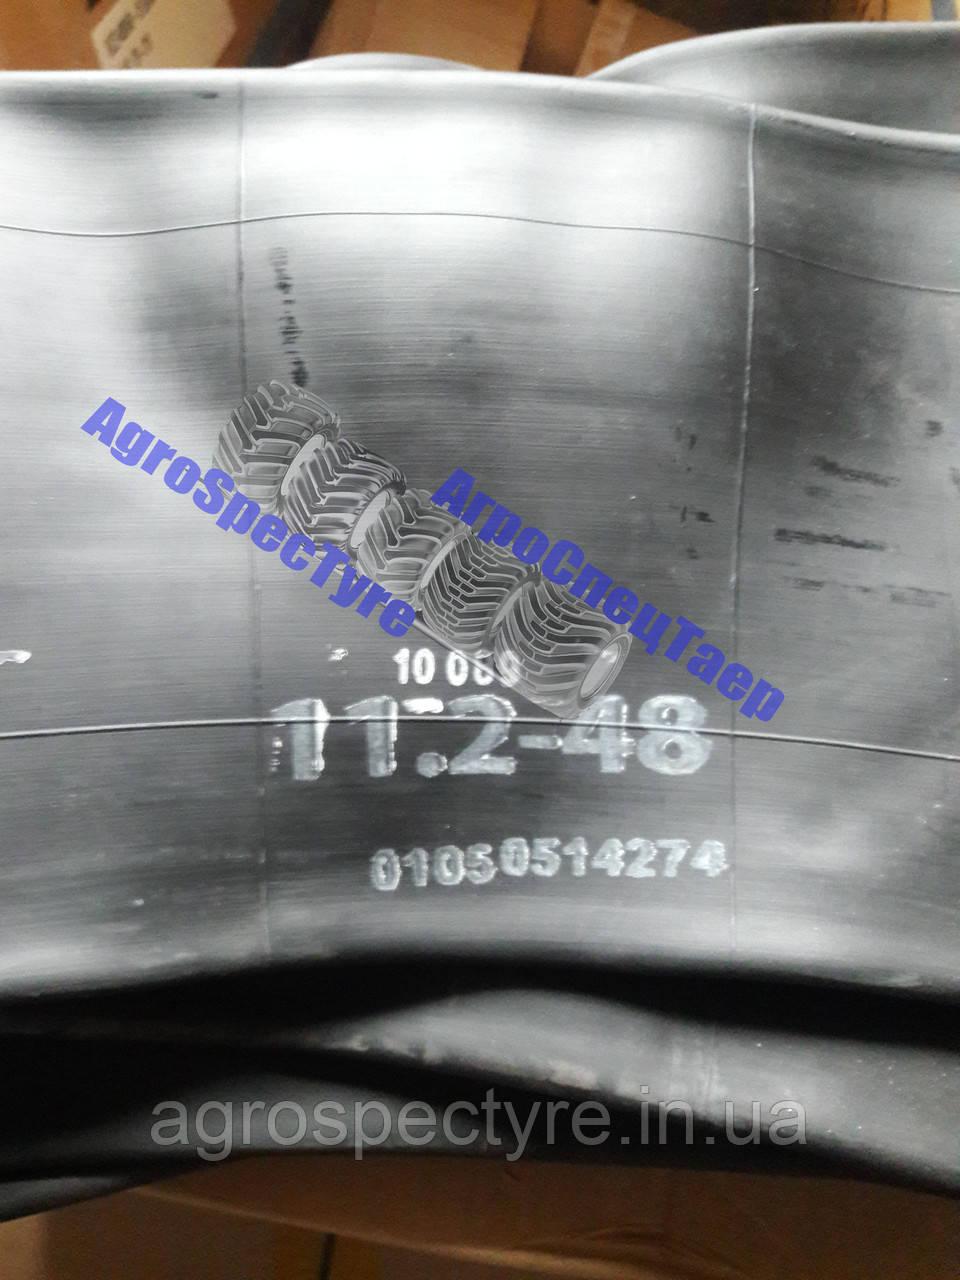 Камера для трактора 11.2-48 TR-218A KABAT Камера для трактора 270/95-48 TR-218A KABAT